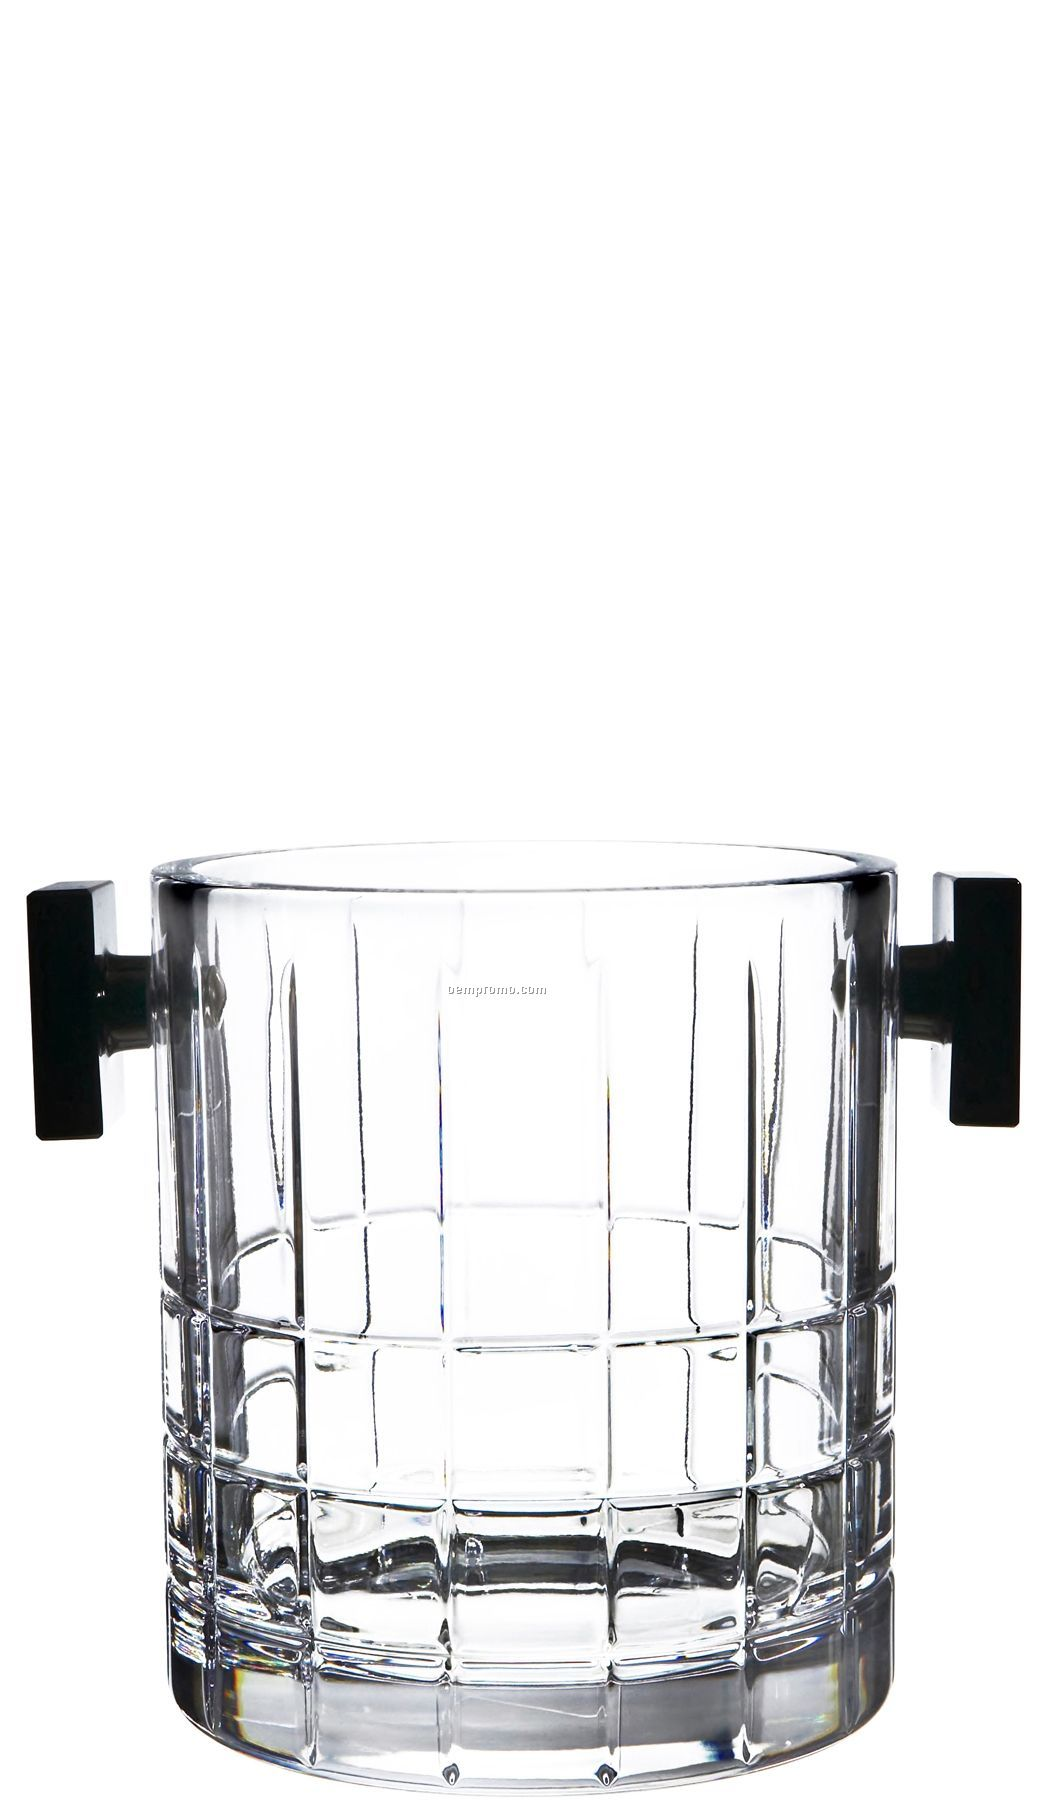 Street Crystal Ice Bucket W/ Manhattan Street Grid